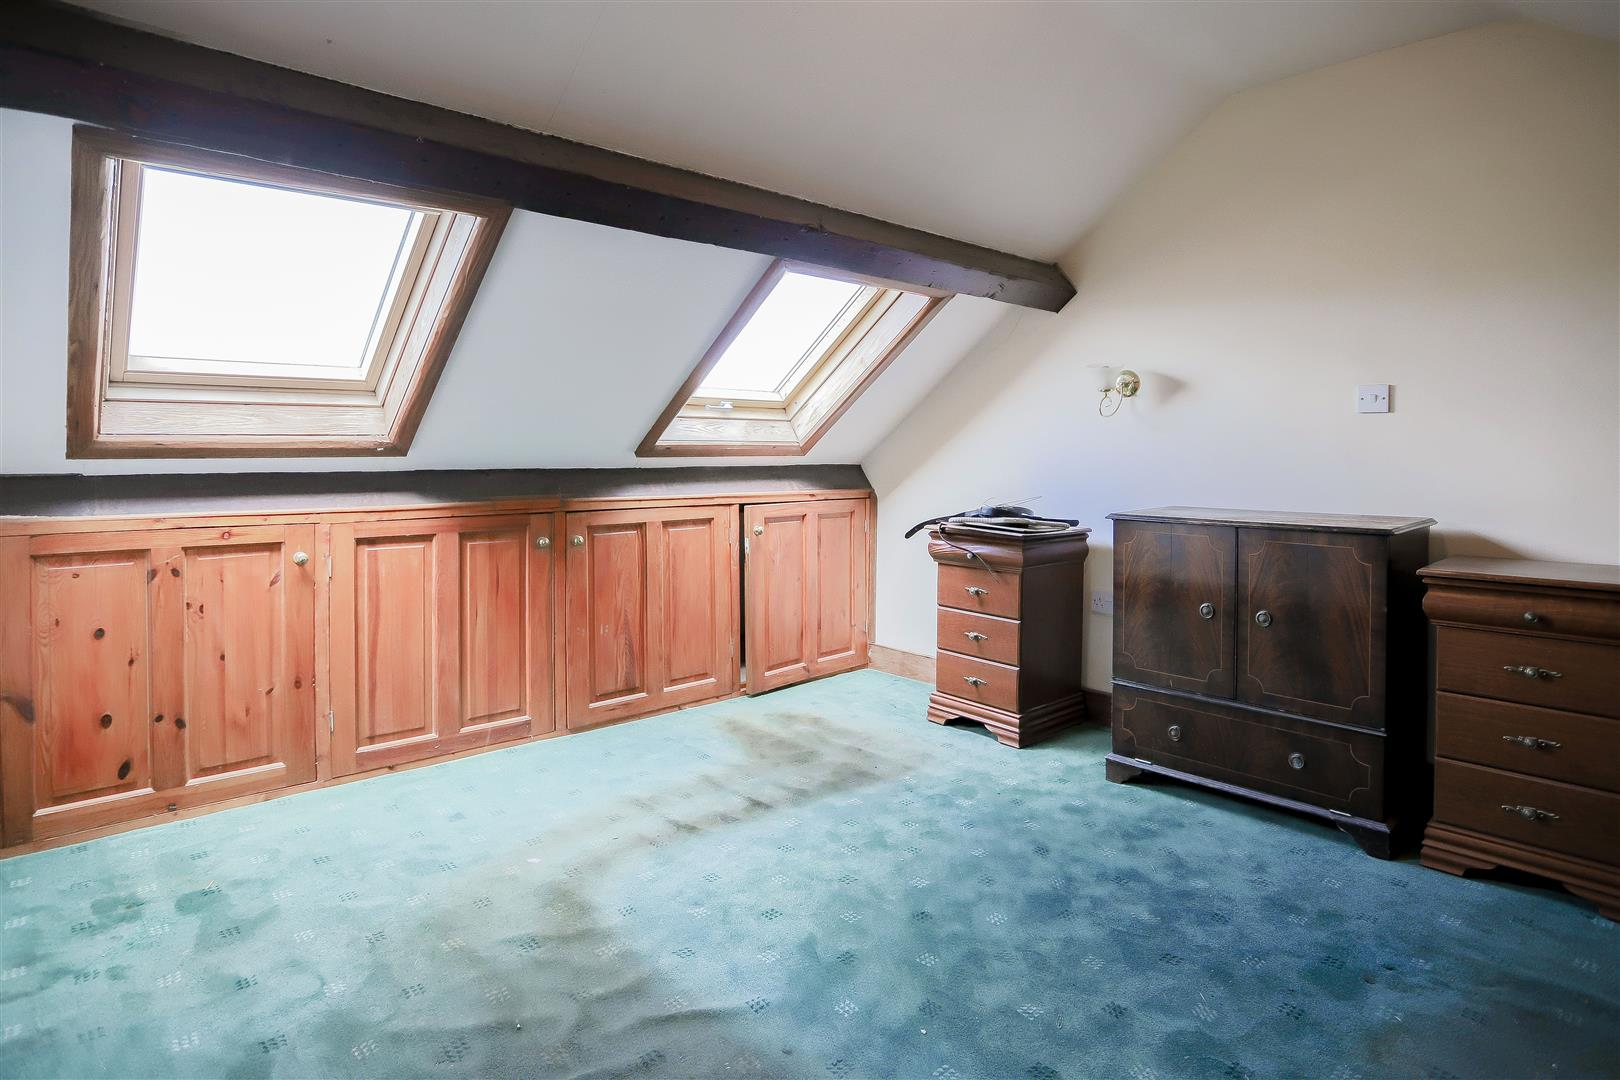 2 Bedroom Barn Conversion For Sale - IMG_2407.jpg